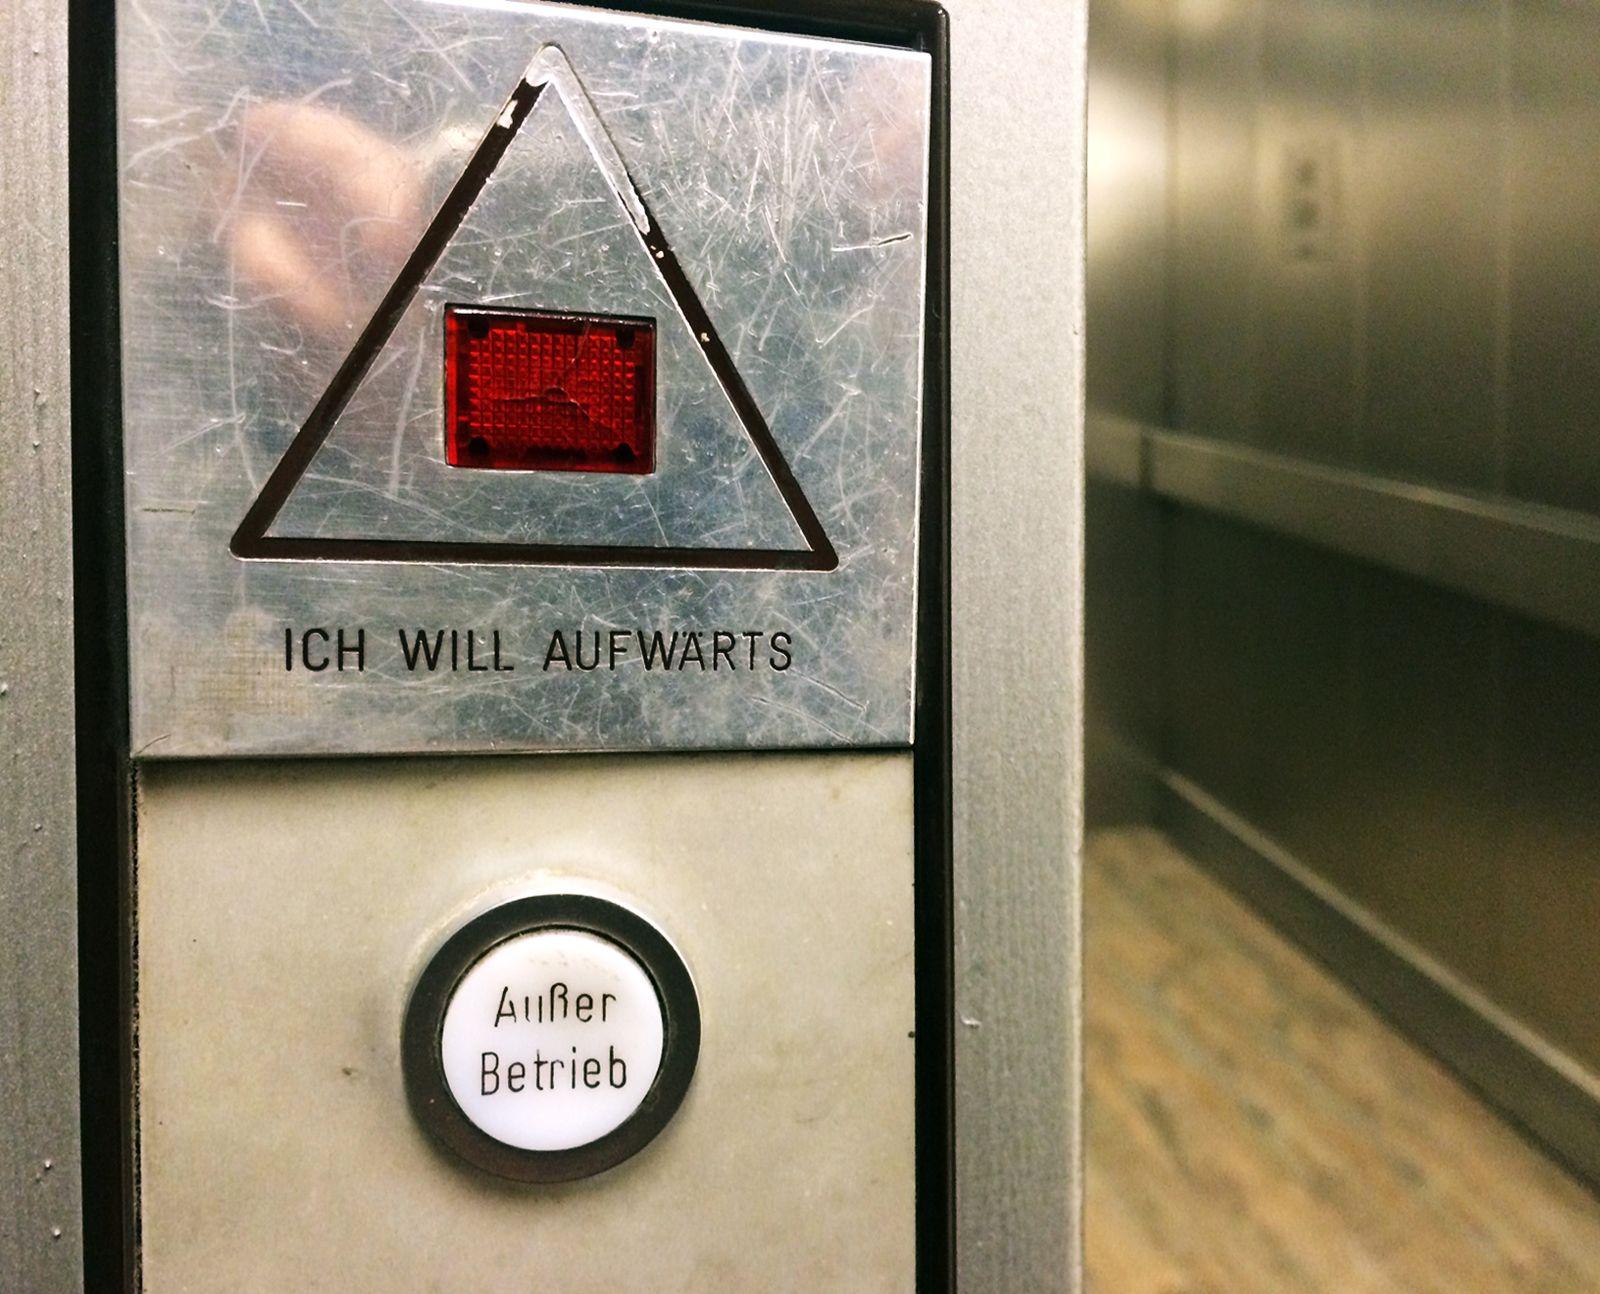 KaSP Fahrstuhl aufwärts SYMBOLBILD